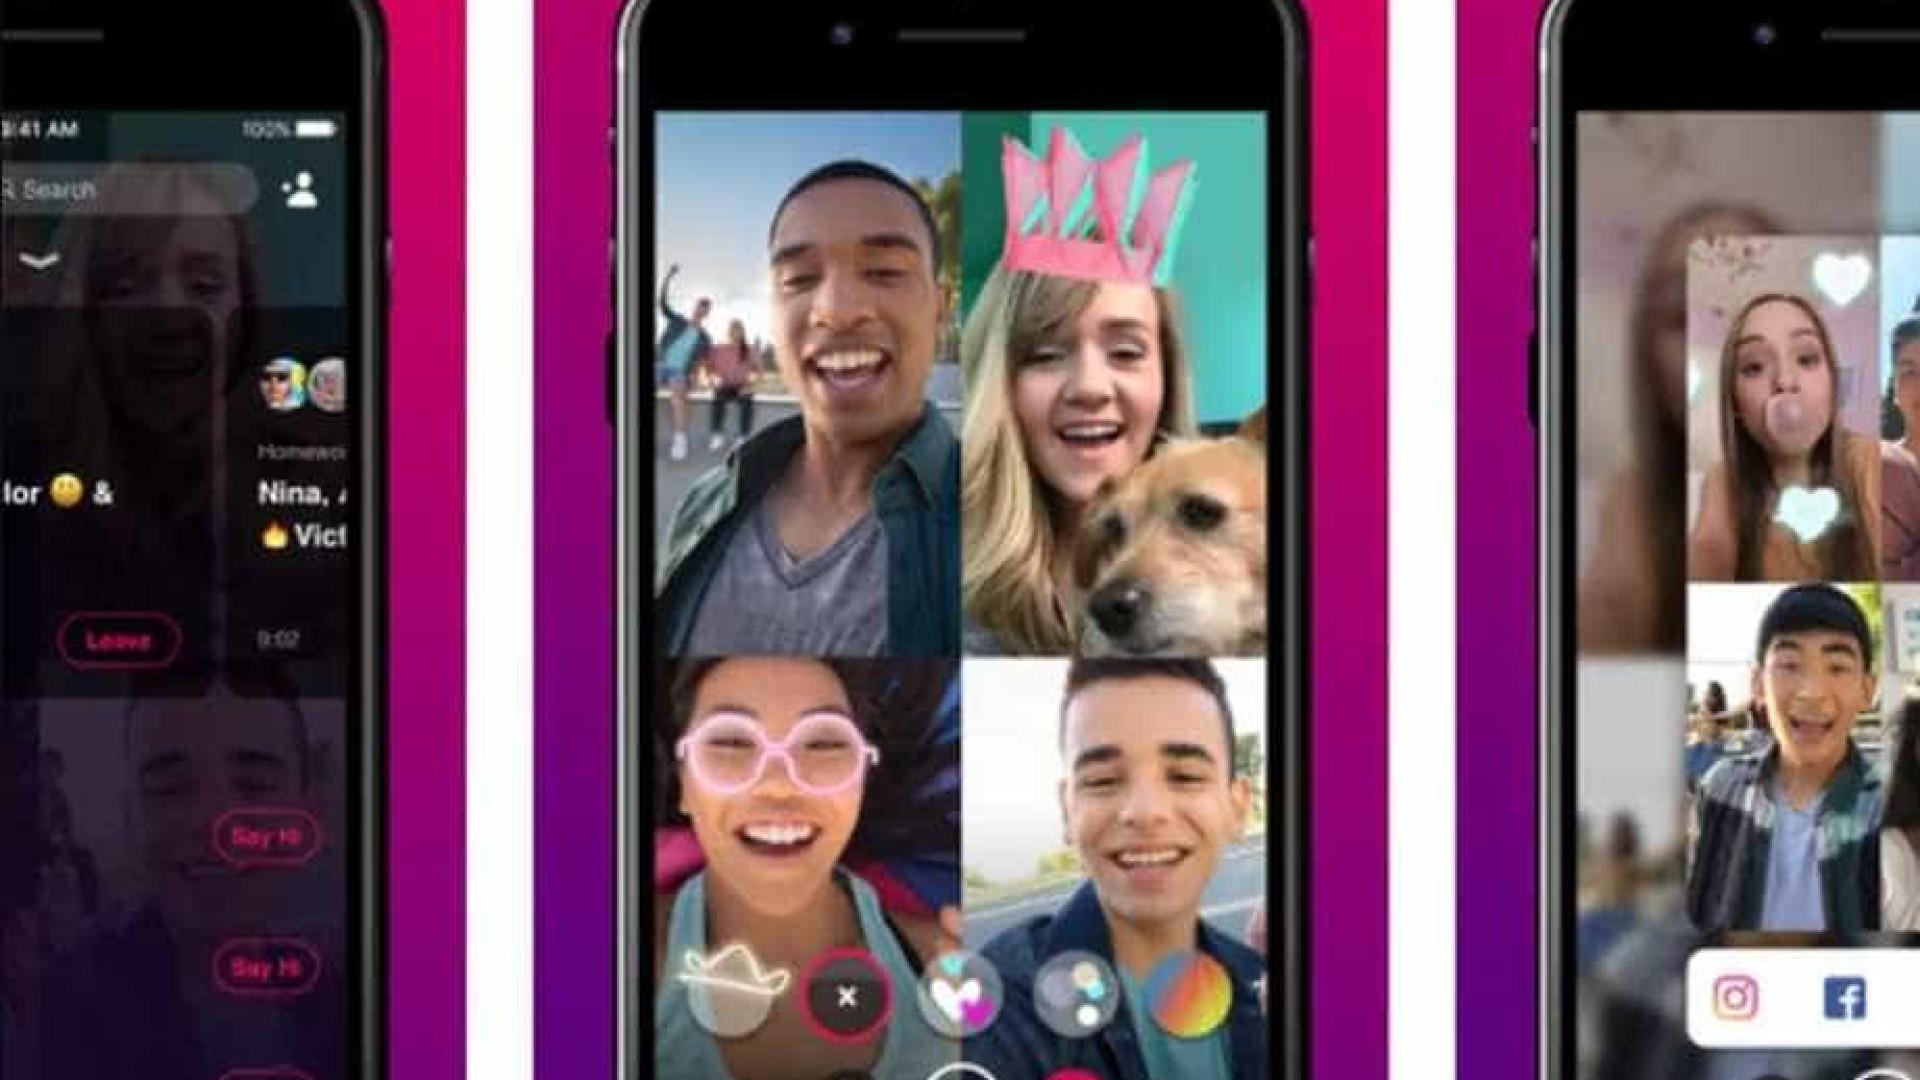 Chama-se Bonfire e é a app de vídeo secreta do Facebook